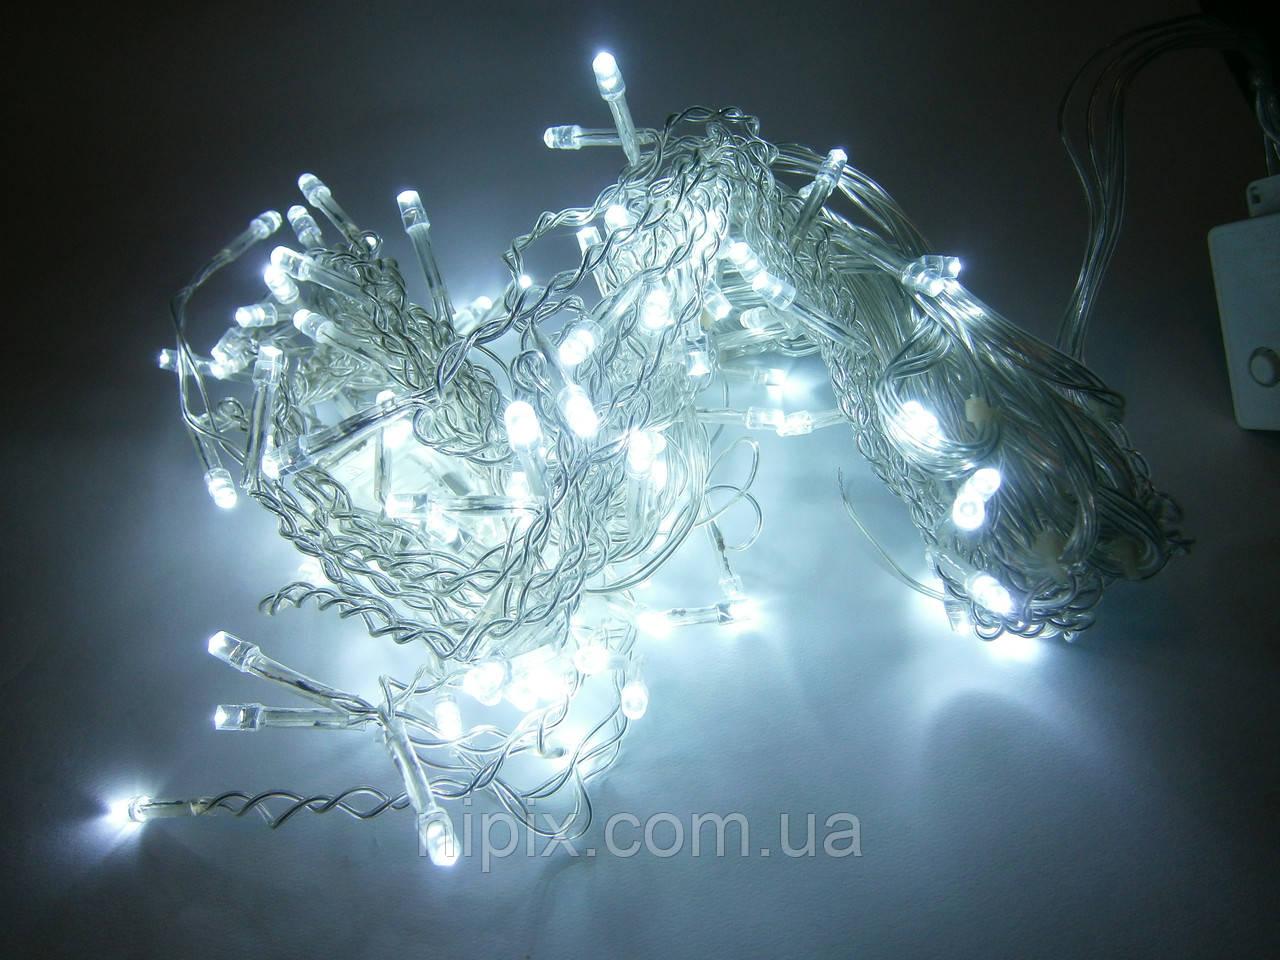 Гирлянда светодиодная бахрома 120 LED белая